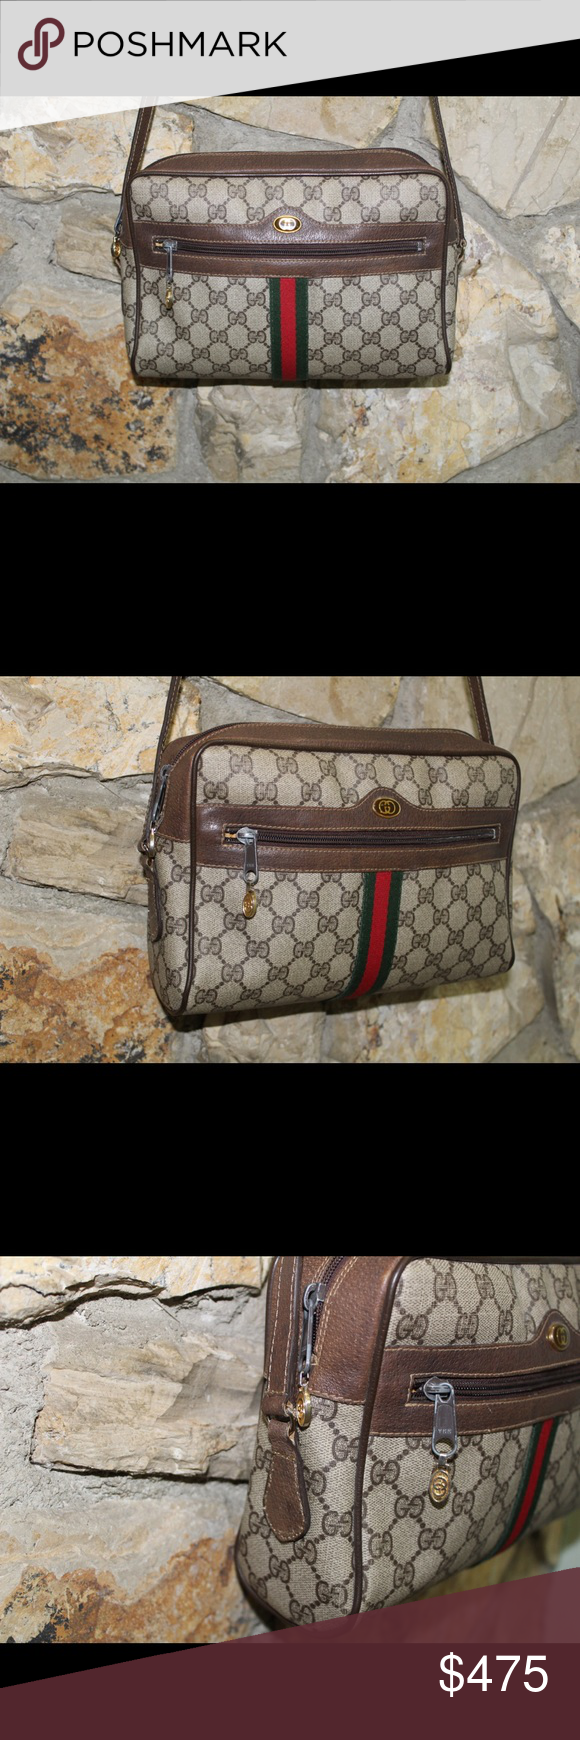 cf99c84bea0ae0 Authentic VTG Gucci Ophelia Crossbody Shoulder Bag Vintage Authentic Gucci  Ophelia Crossbody Shoulder Bag. This